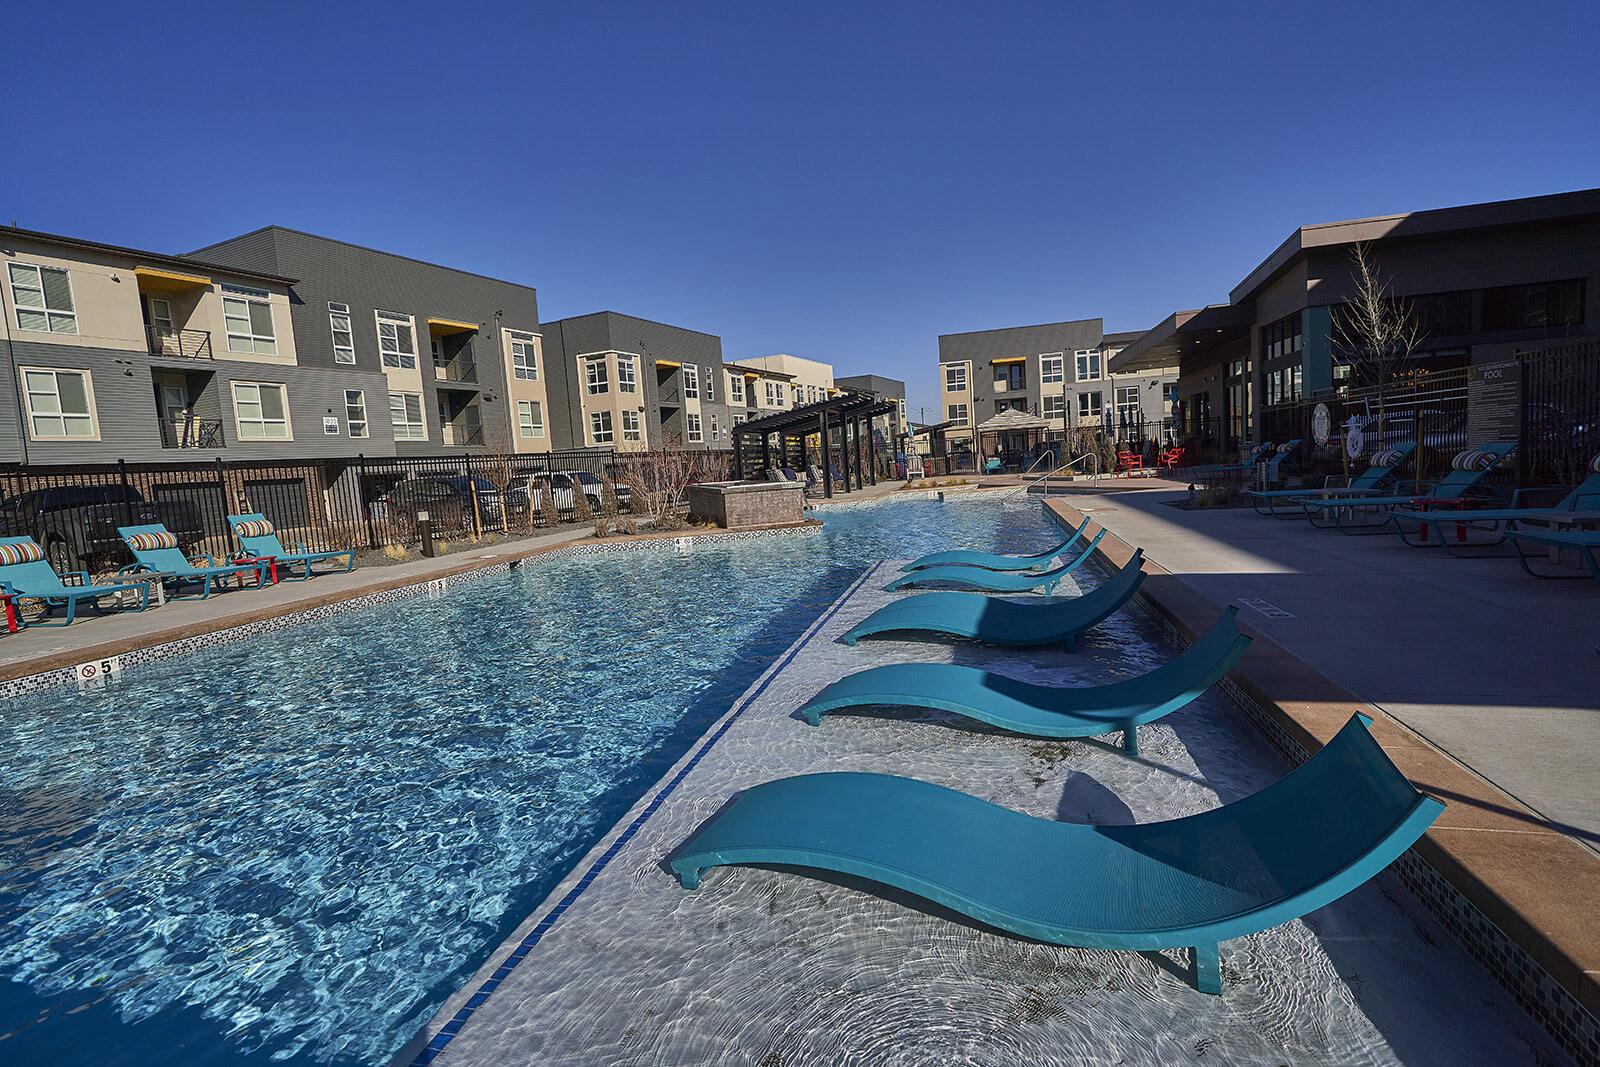 Mission Rock Assumes Management of 224-Unit Apartment Community in Denver's Popular Platt Park Neighborhood